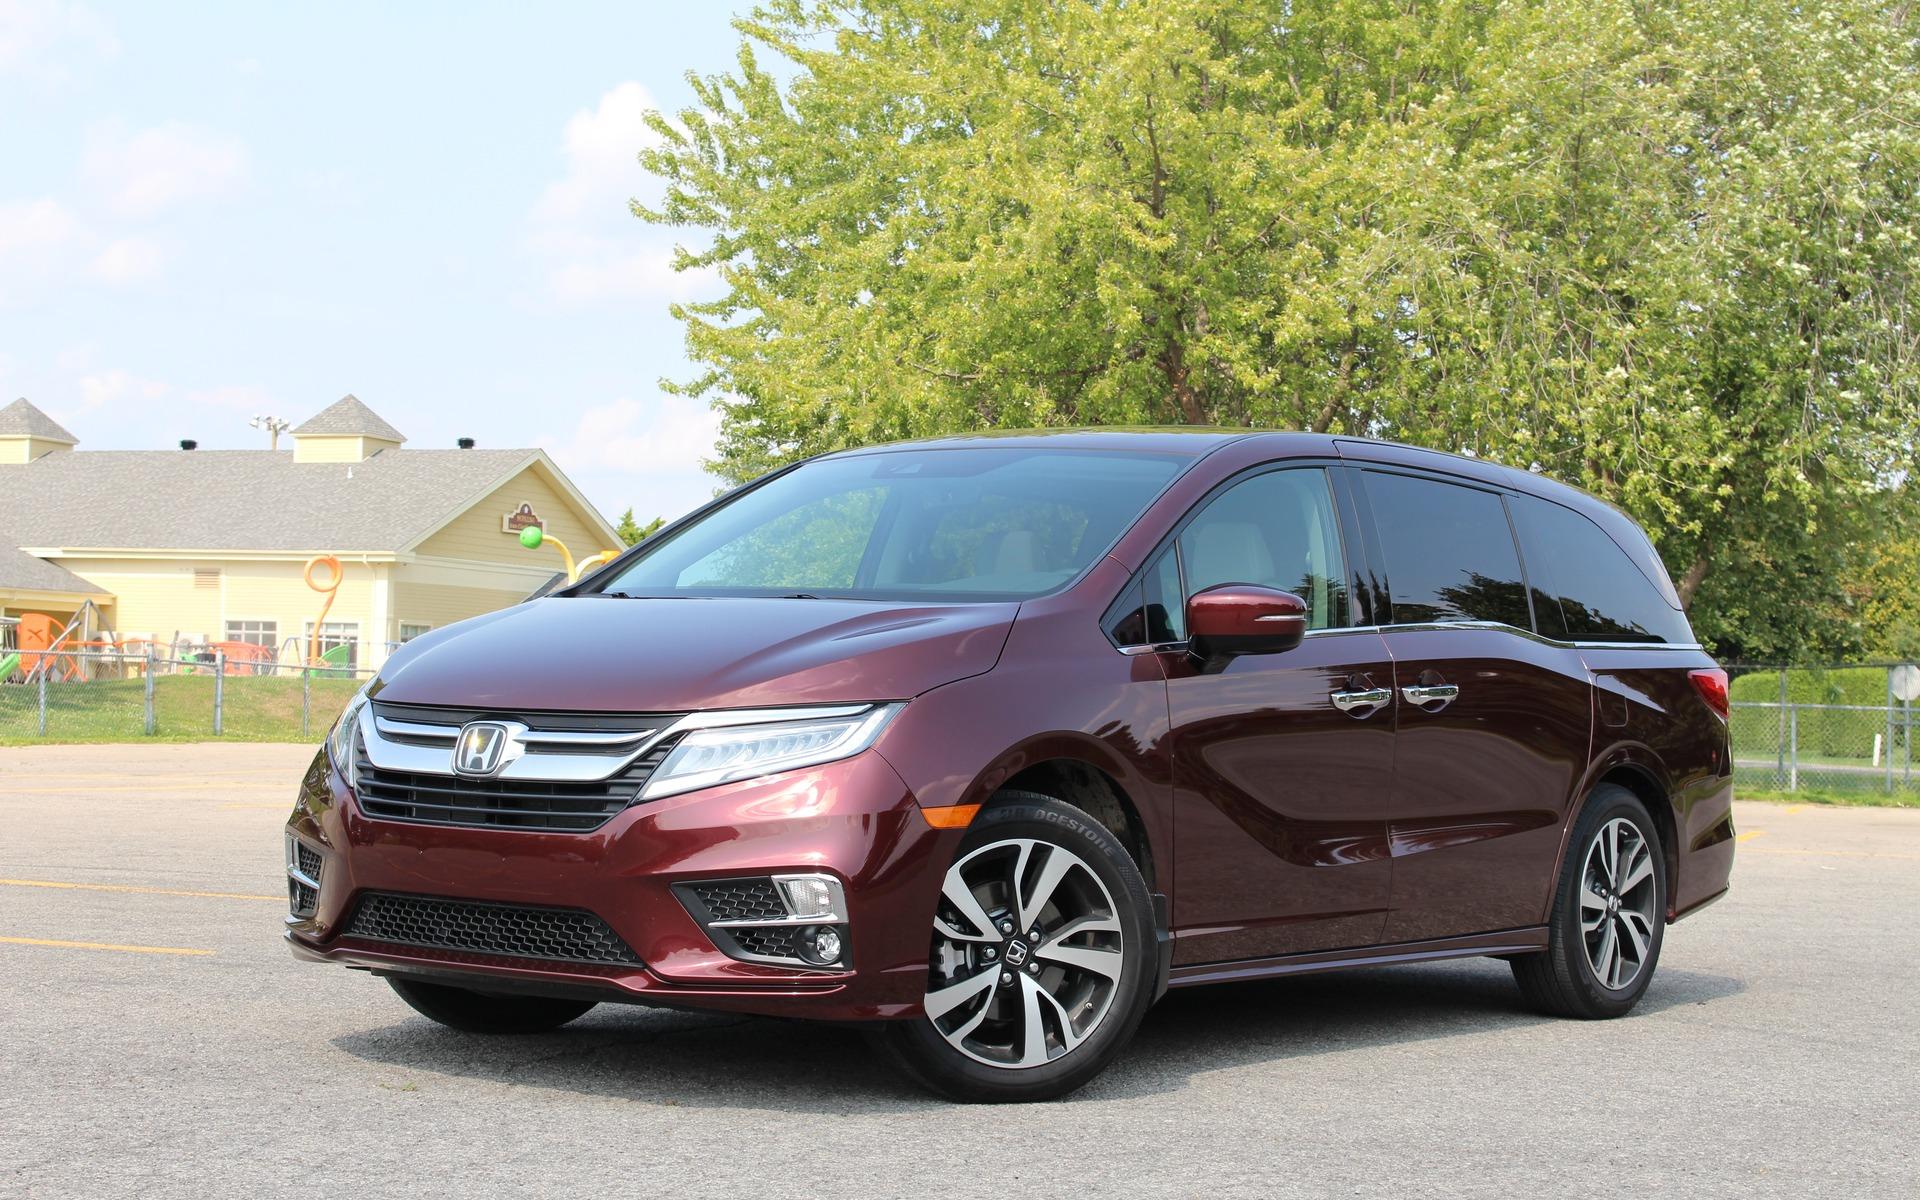 2018 Honda Odyssey Technovan The Car Guide Fuel Pump Unit In